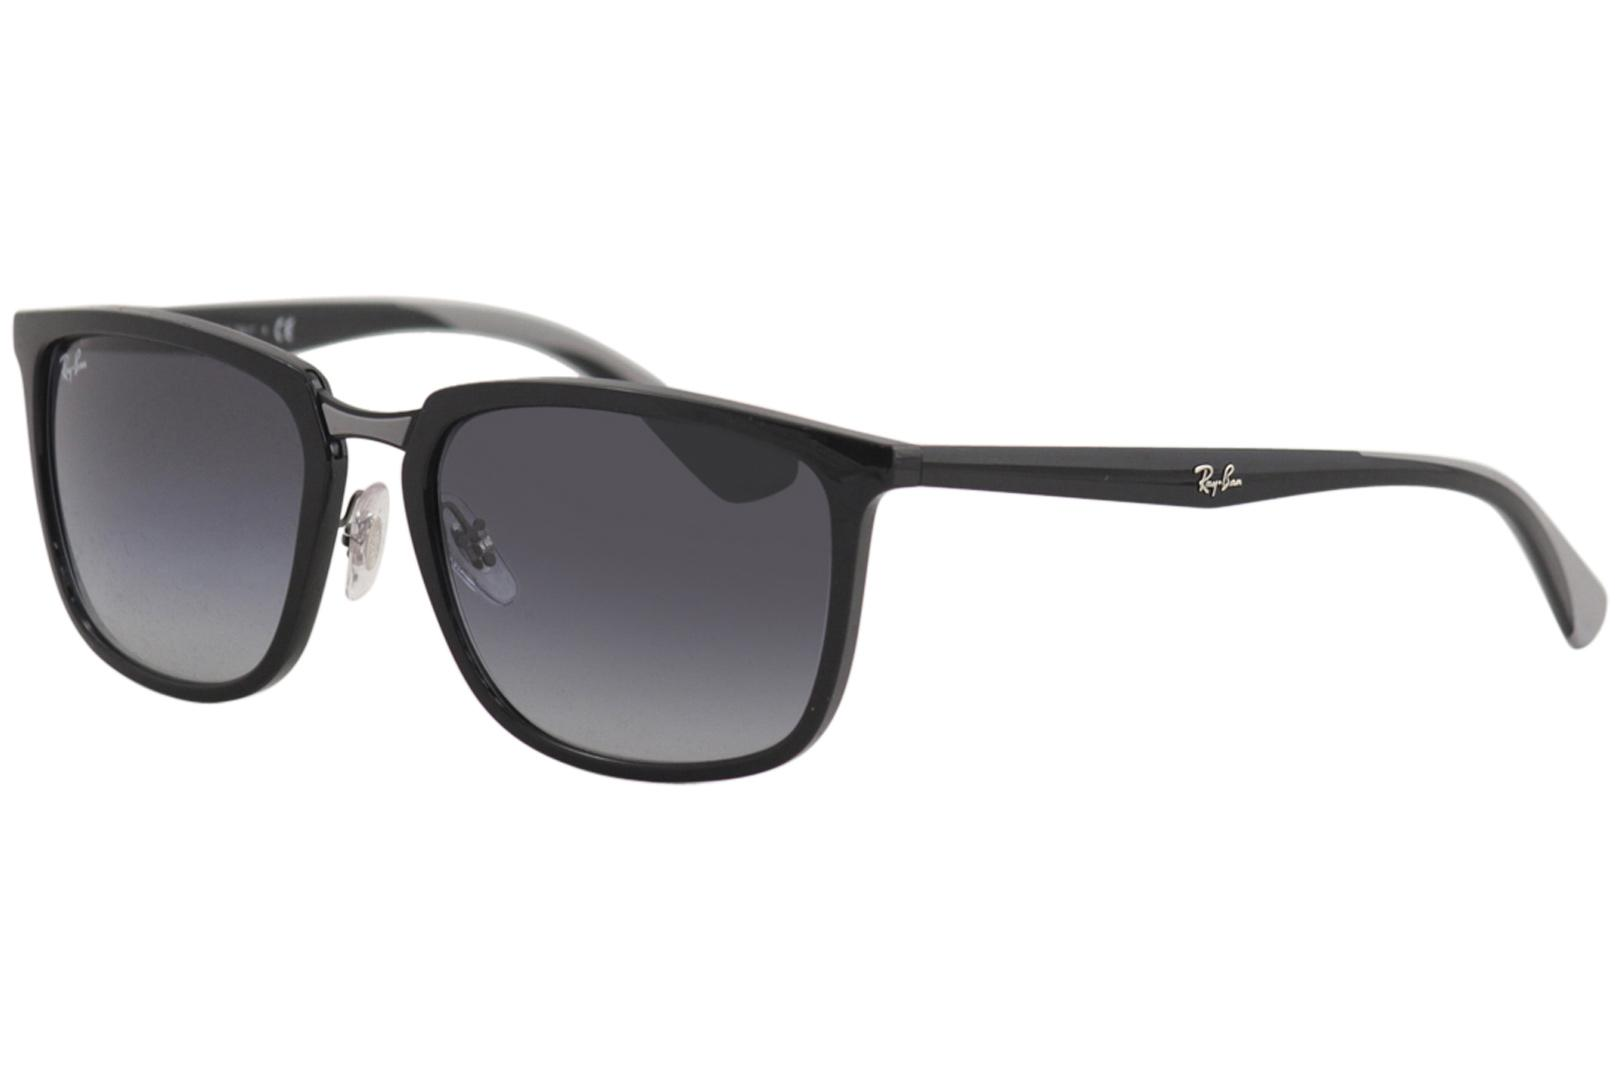 91cf8a8c0b92 Ray Ban Men's RB4303 RB/4303 RayBan Fashion Square Sunglasses by Ray Ban